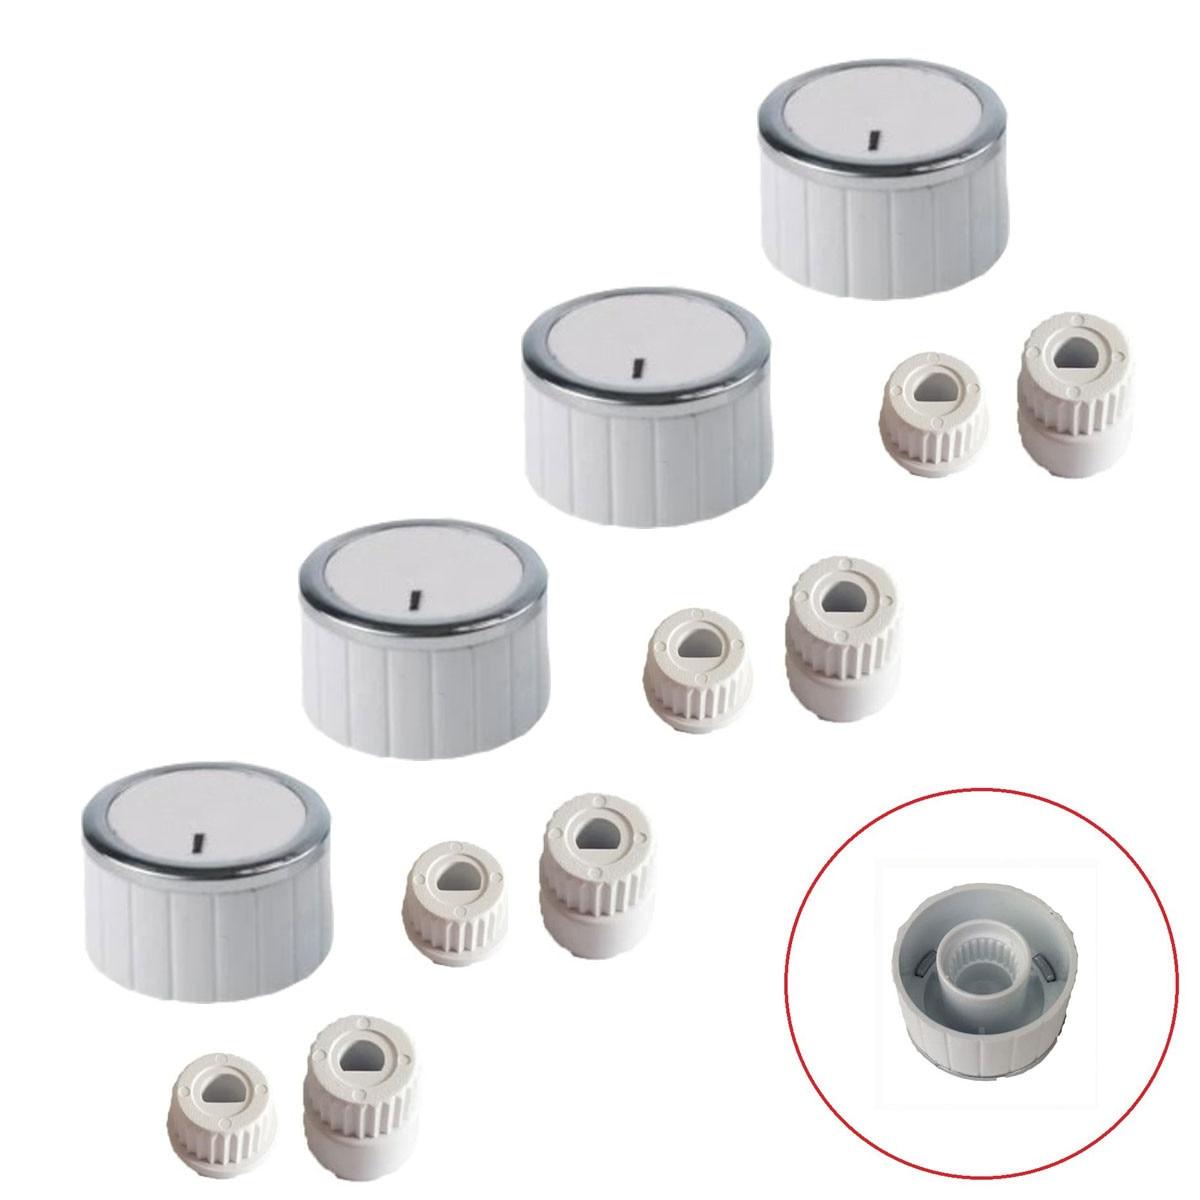 İtimat Button 4 pcs Team Flush Cooktop Button-TYPE 2 White HT-SÜ0013-21